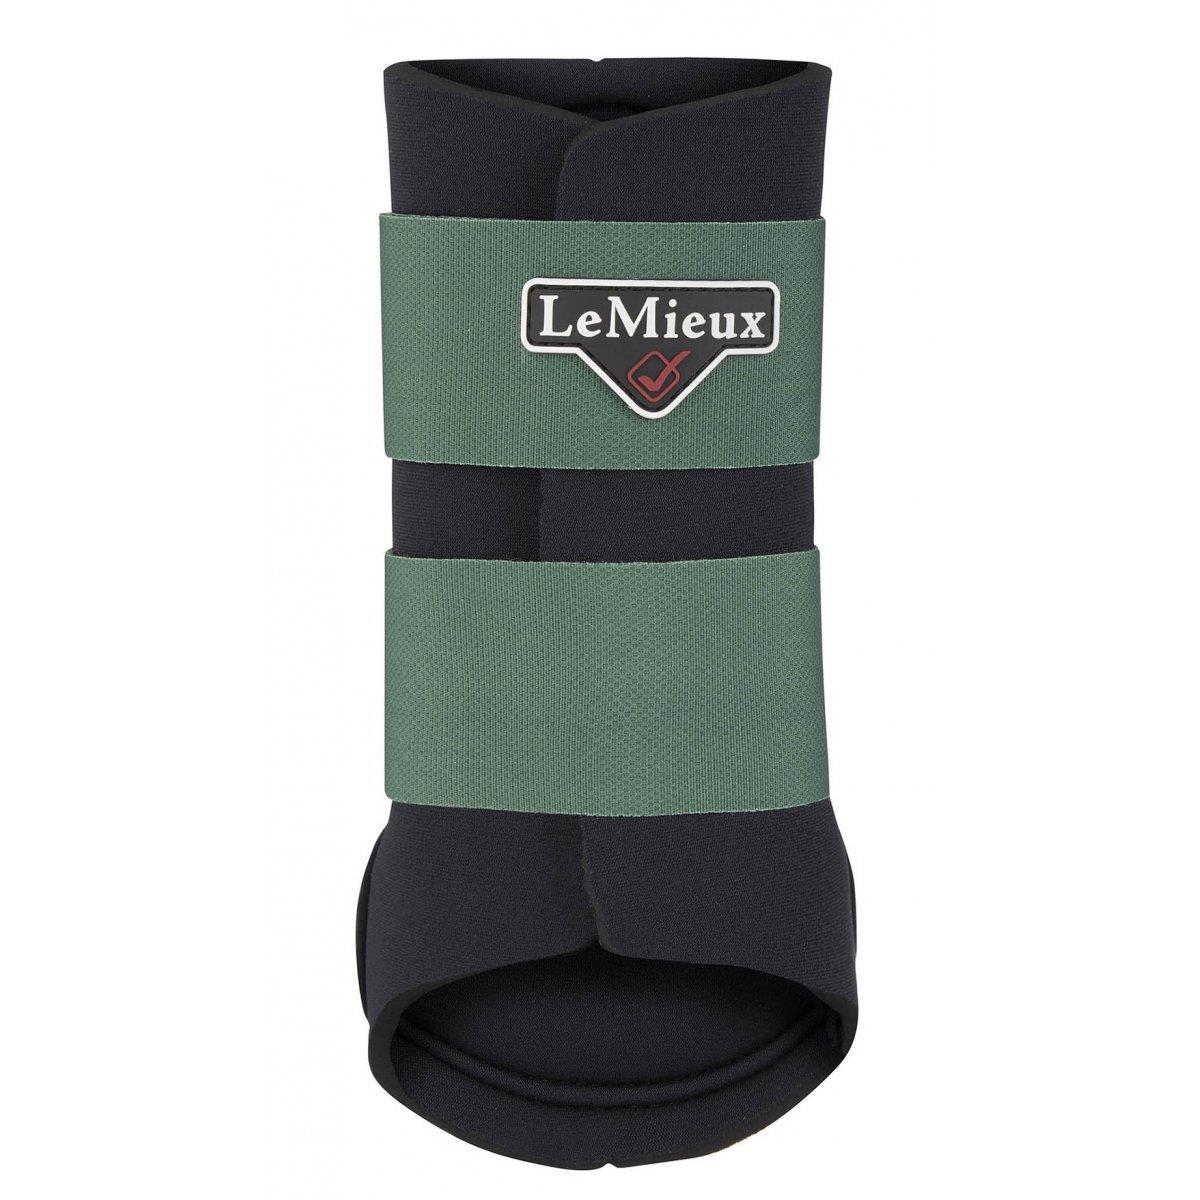 Benetton Blue Lemieux Prosport Support Boot Unisex Horse Exercise Wrap